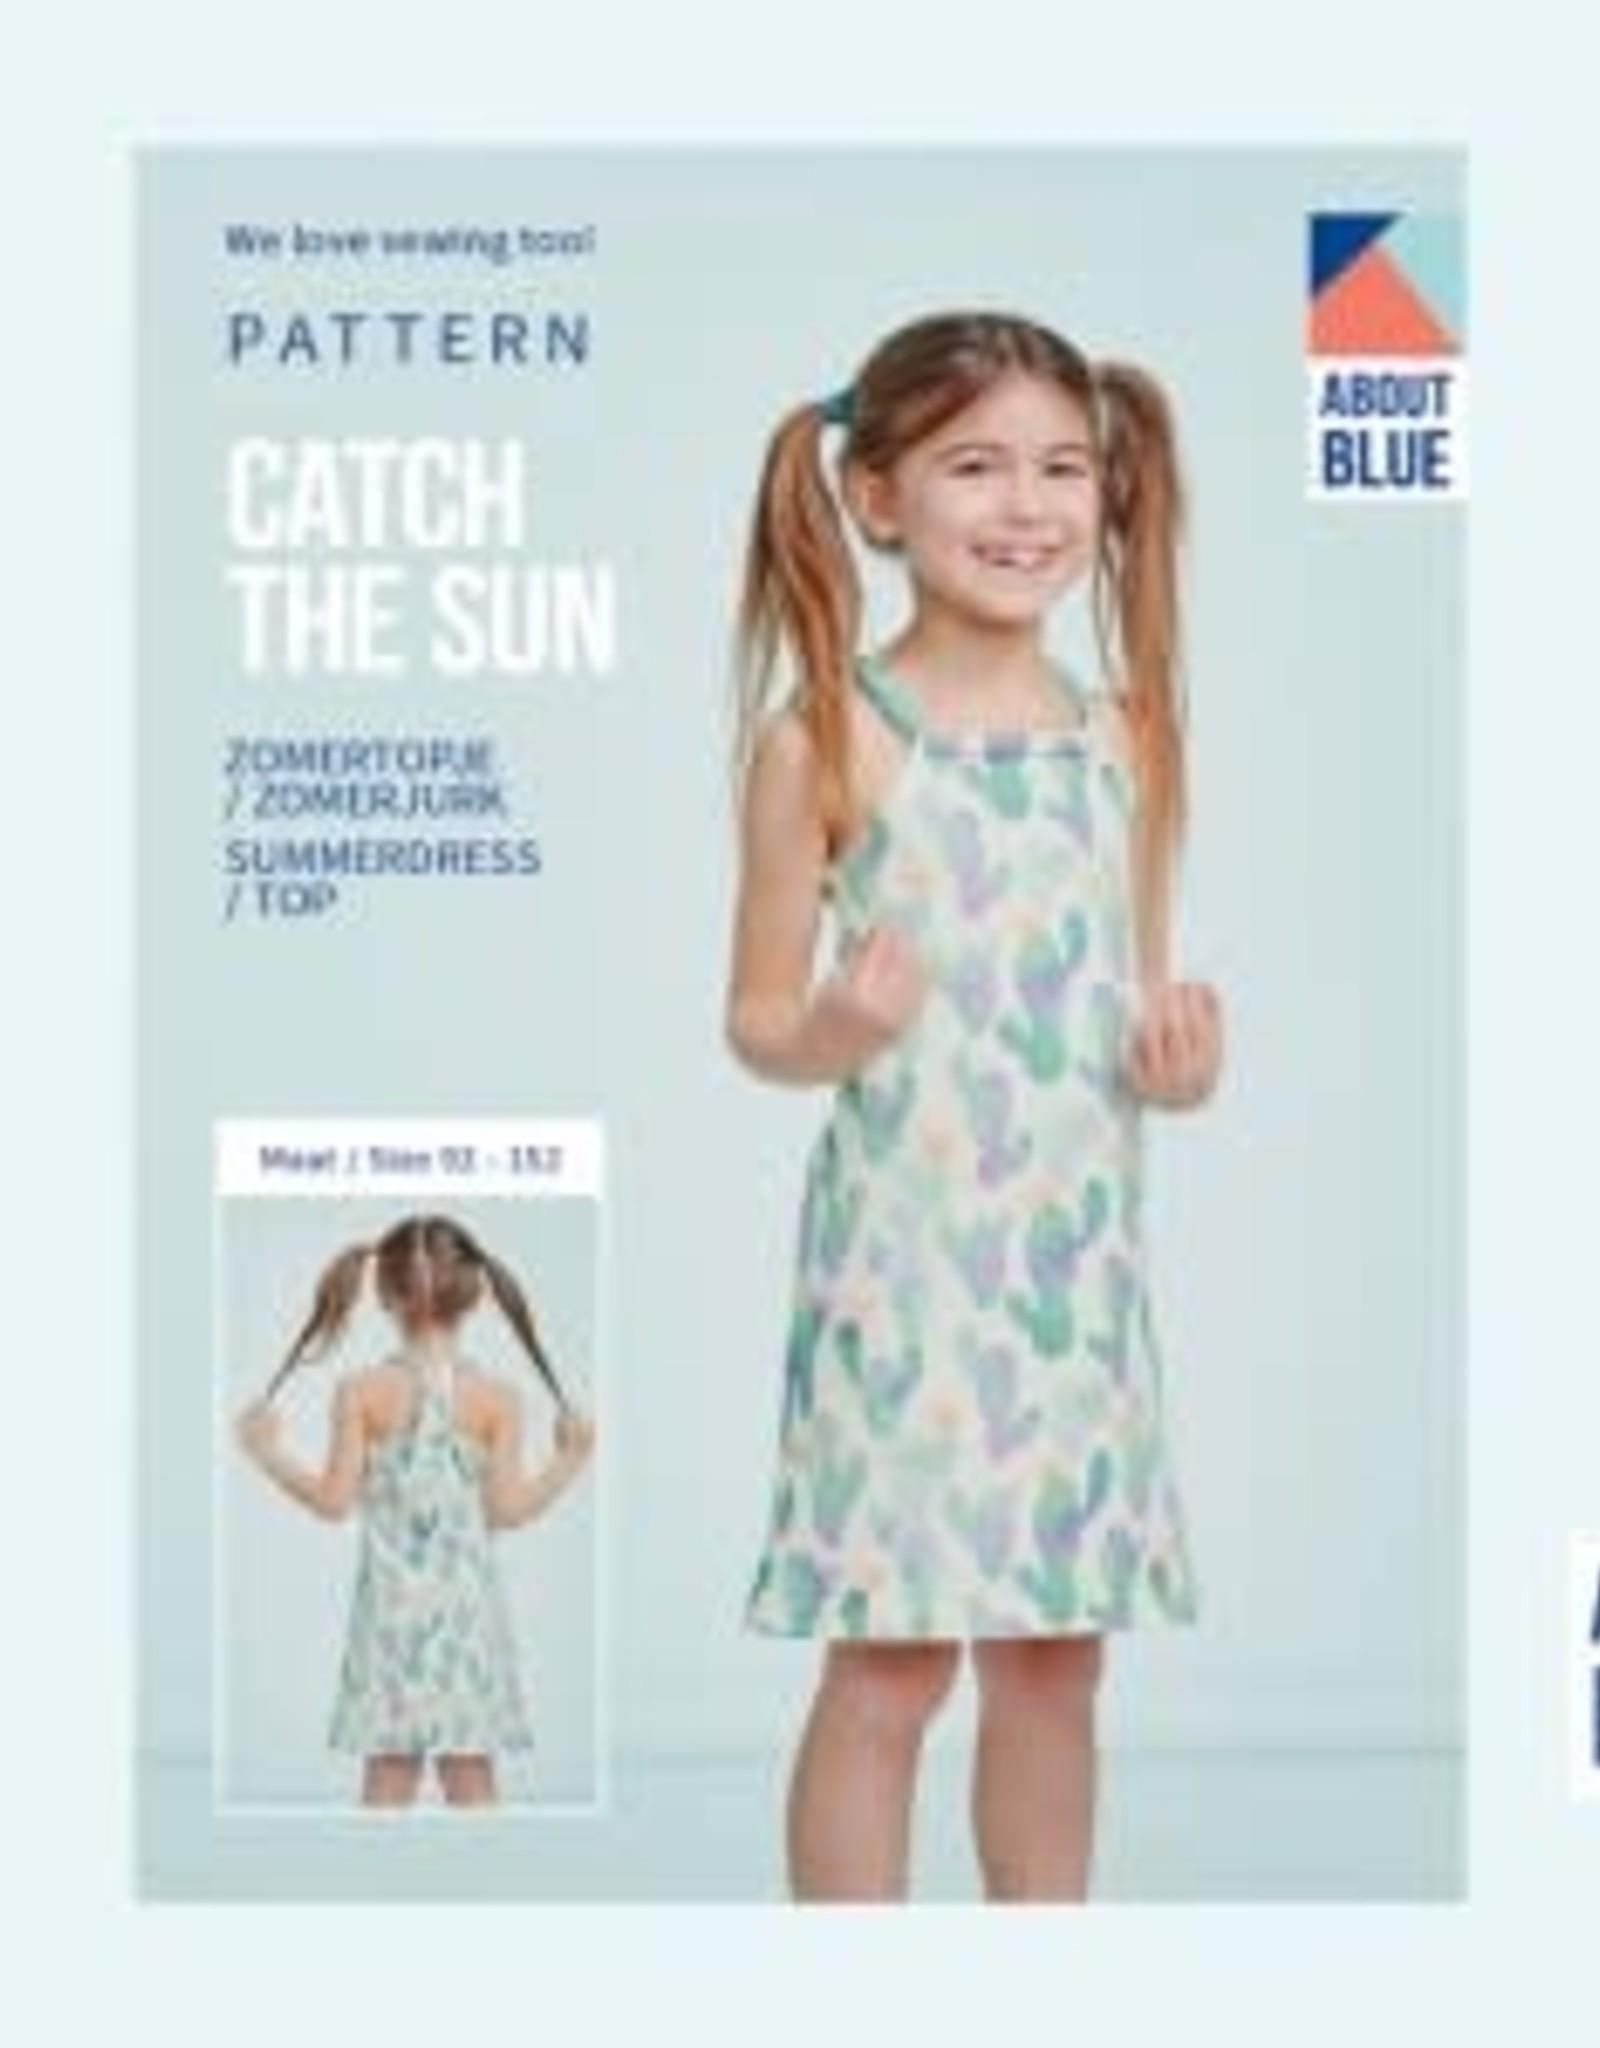 About Blue About Blue papieren naaipatroon Catch The Sun